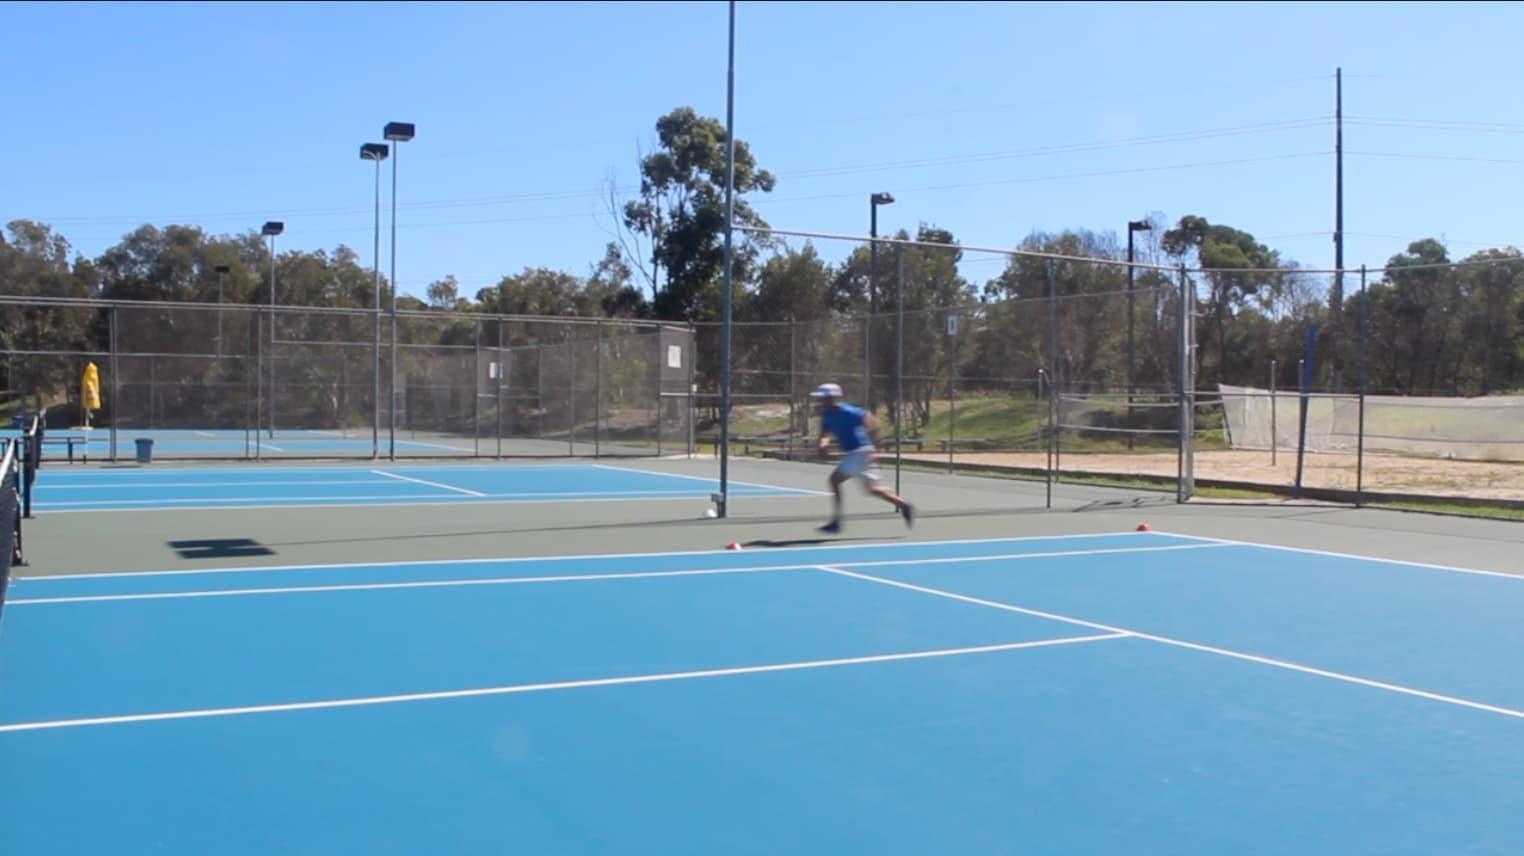 image tennis conditioning